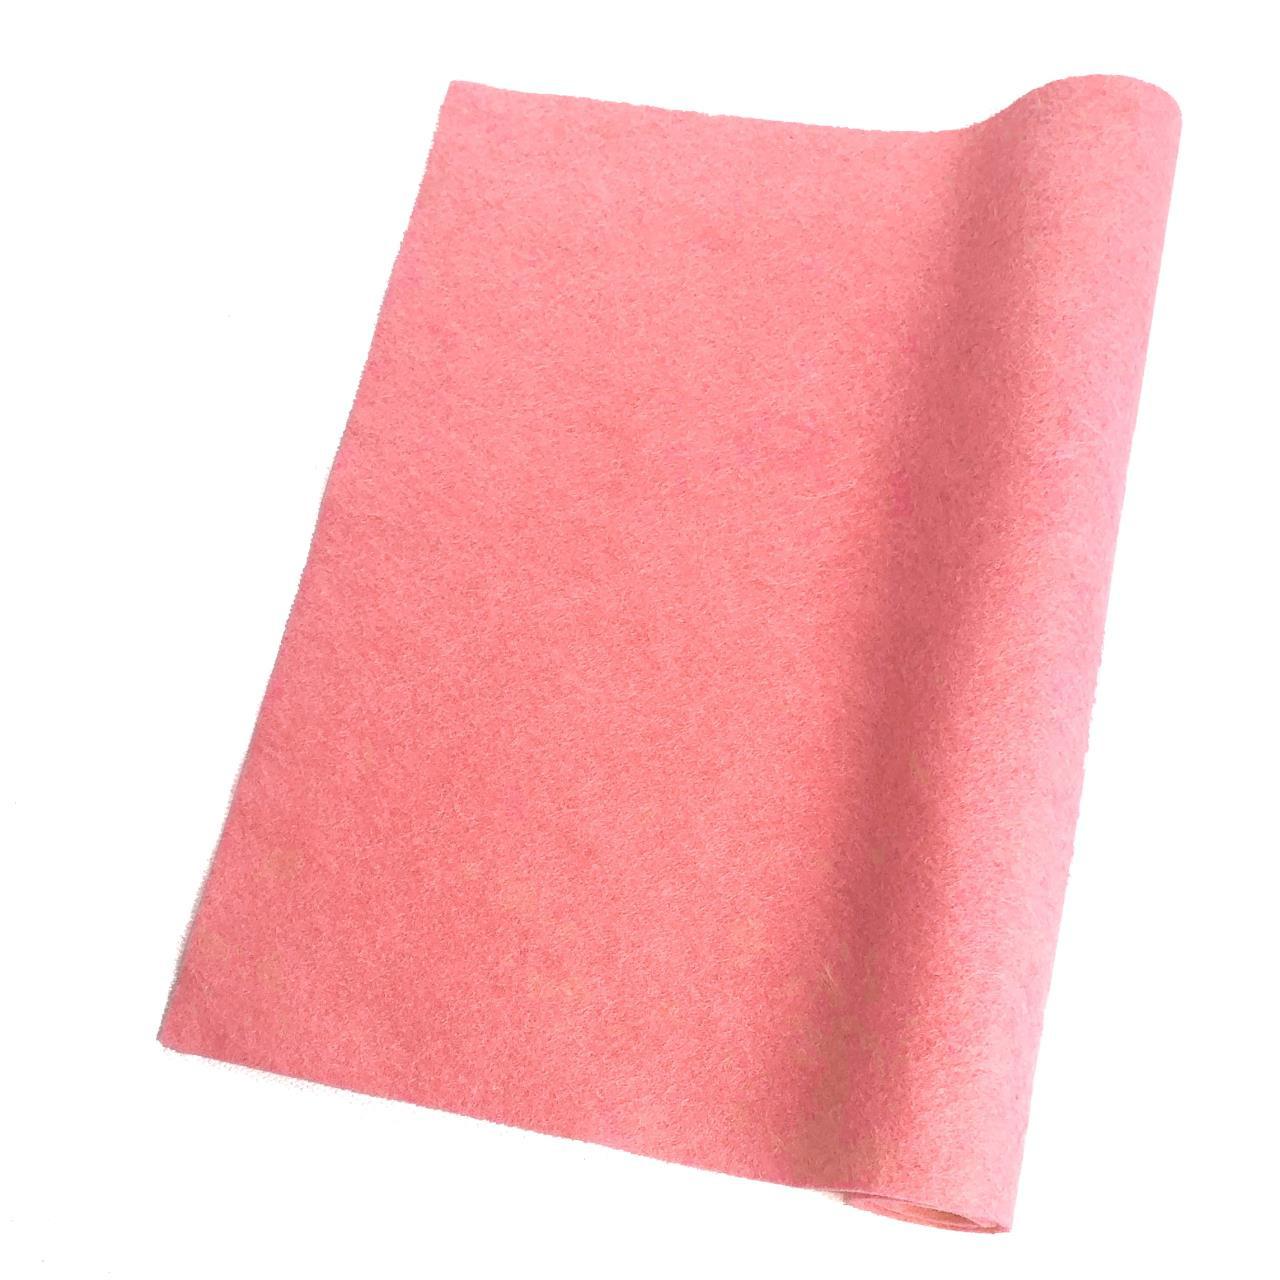 Bubble Gum, Essentials By Ellen Wool Felt 9 X 12 - 5 Pk -